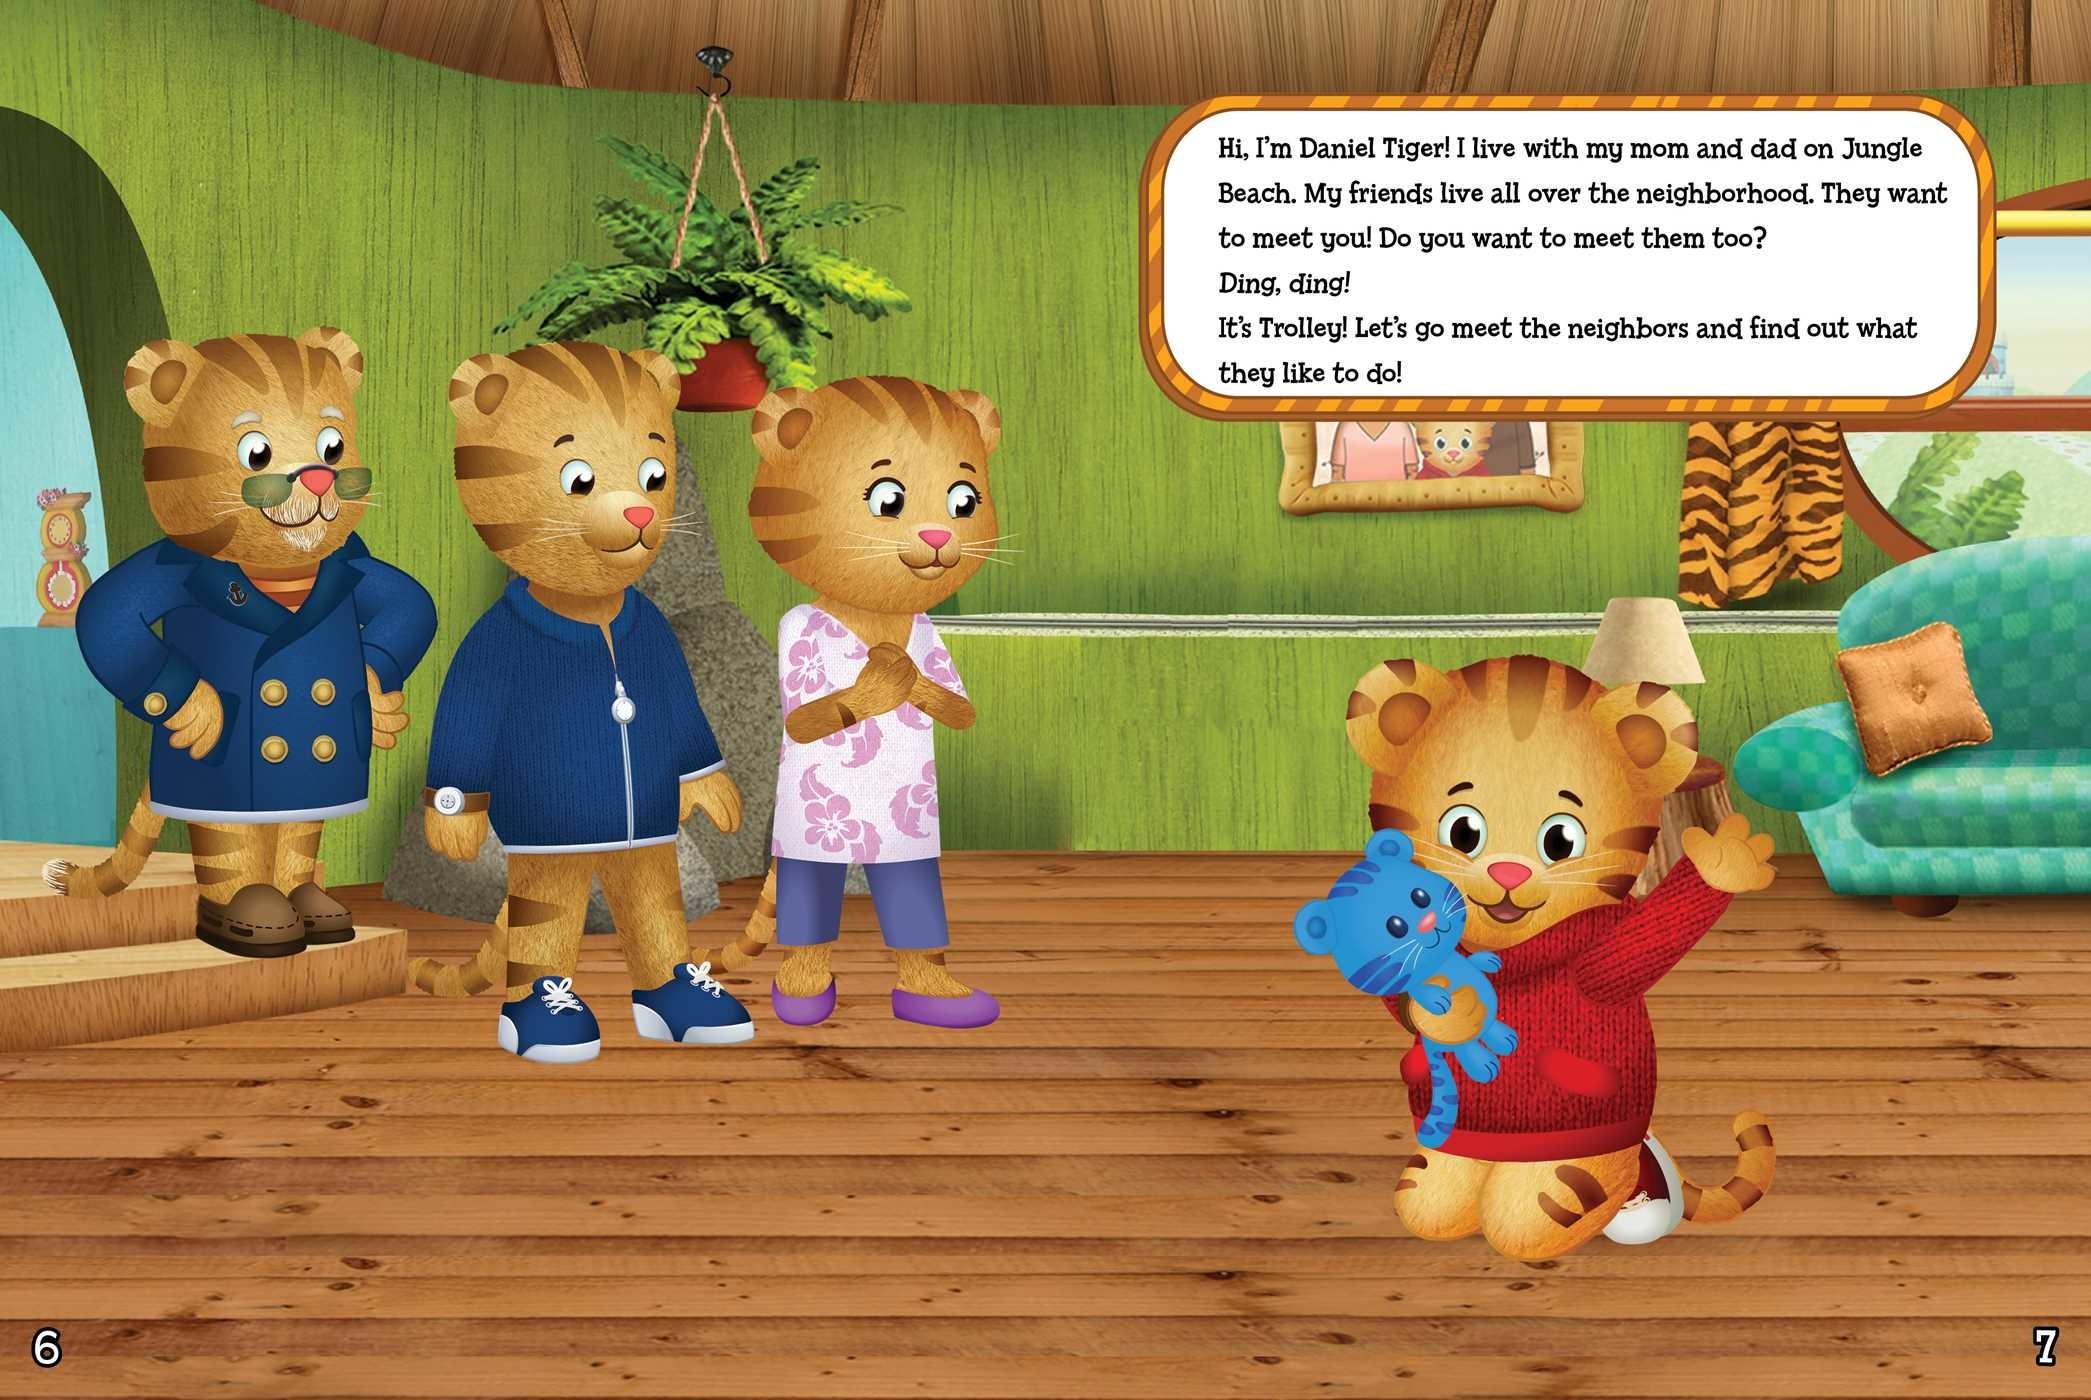 Daniel tigers 3 minute bedtime stories 9781534428591.in01